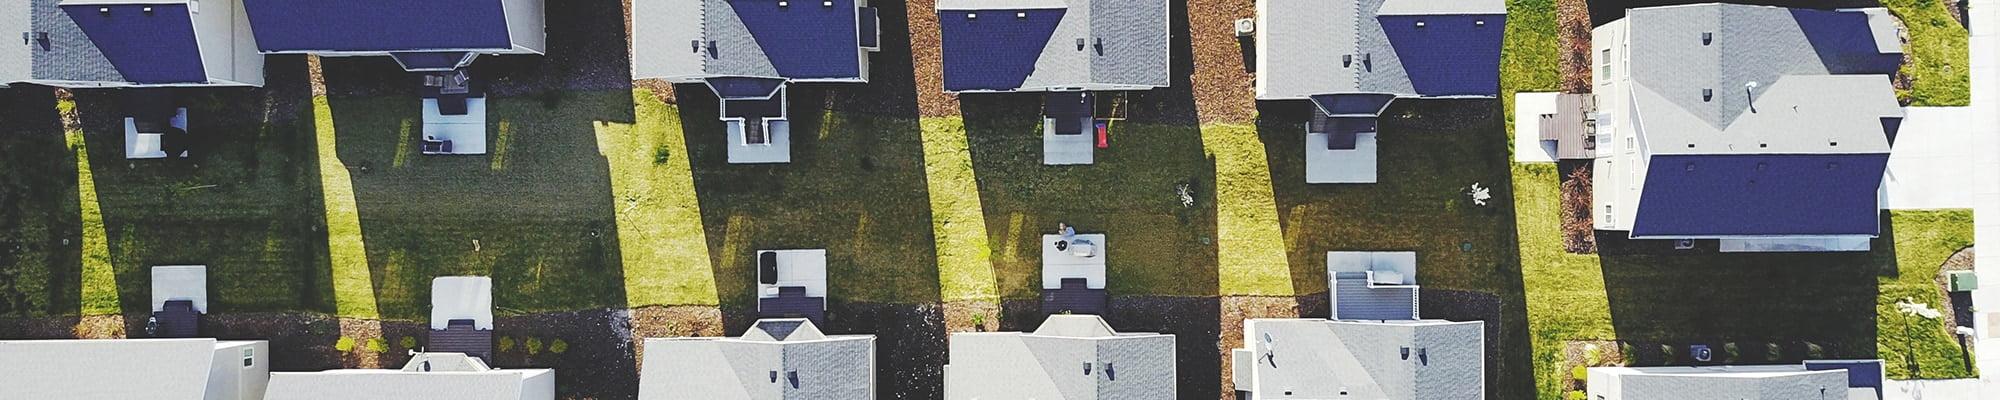 February 2021 Antioch California Housing Market Report for 94509